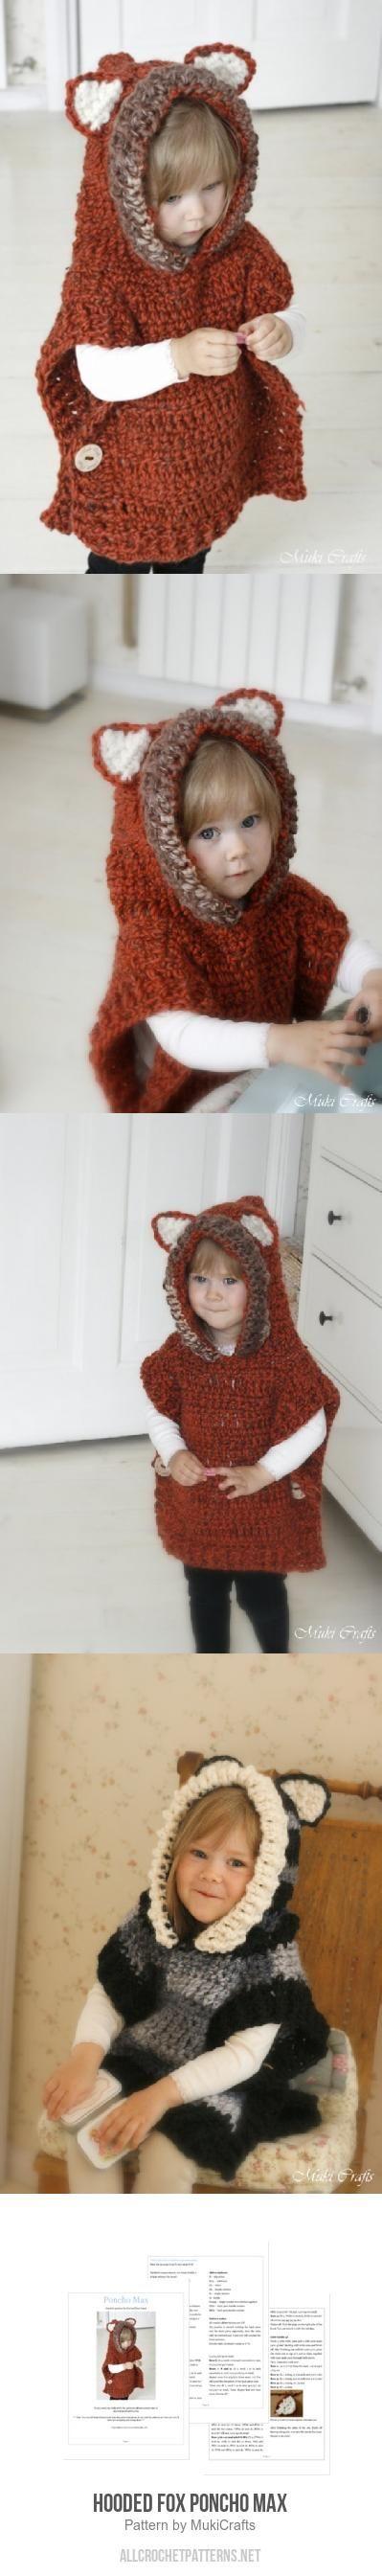 Hooded fox poncho Max crochet pattern